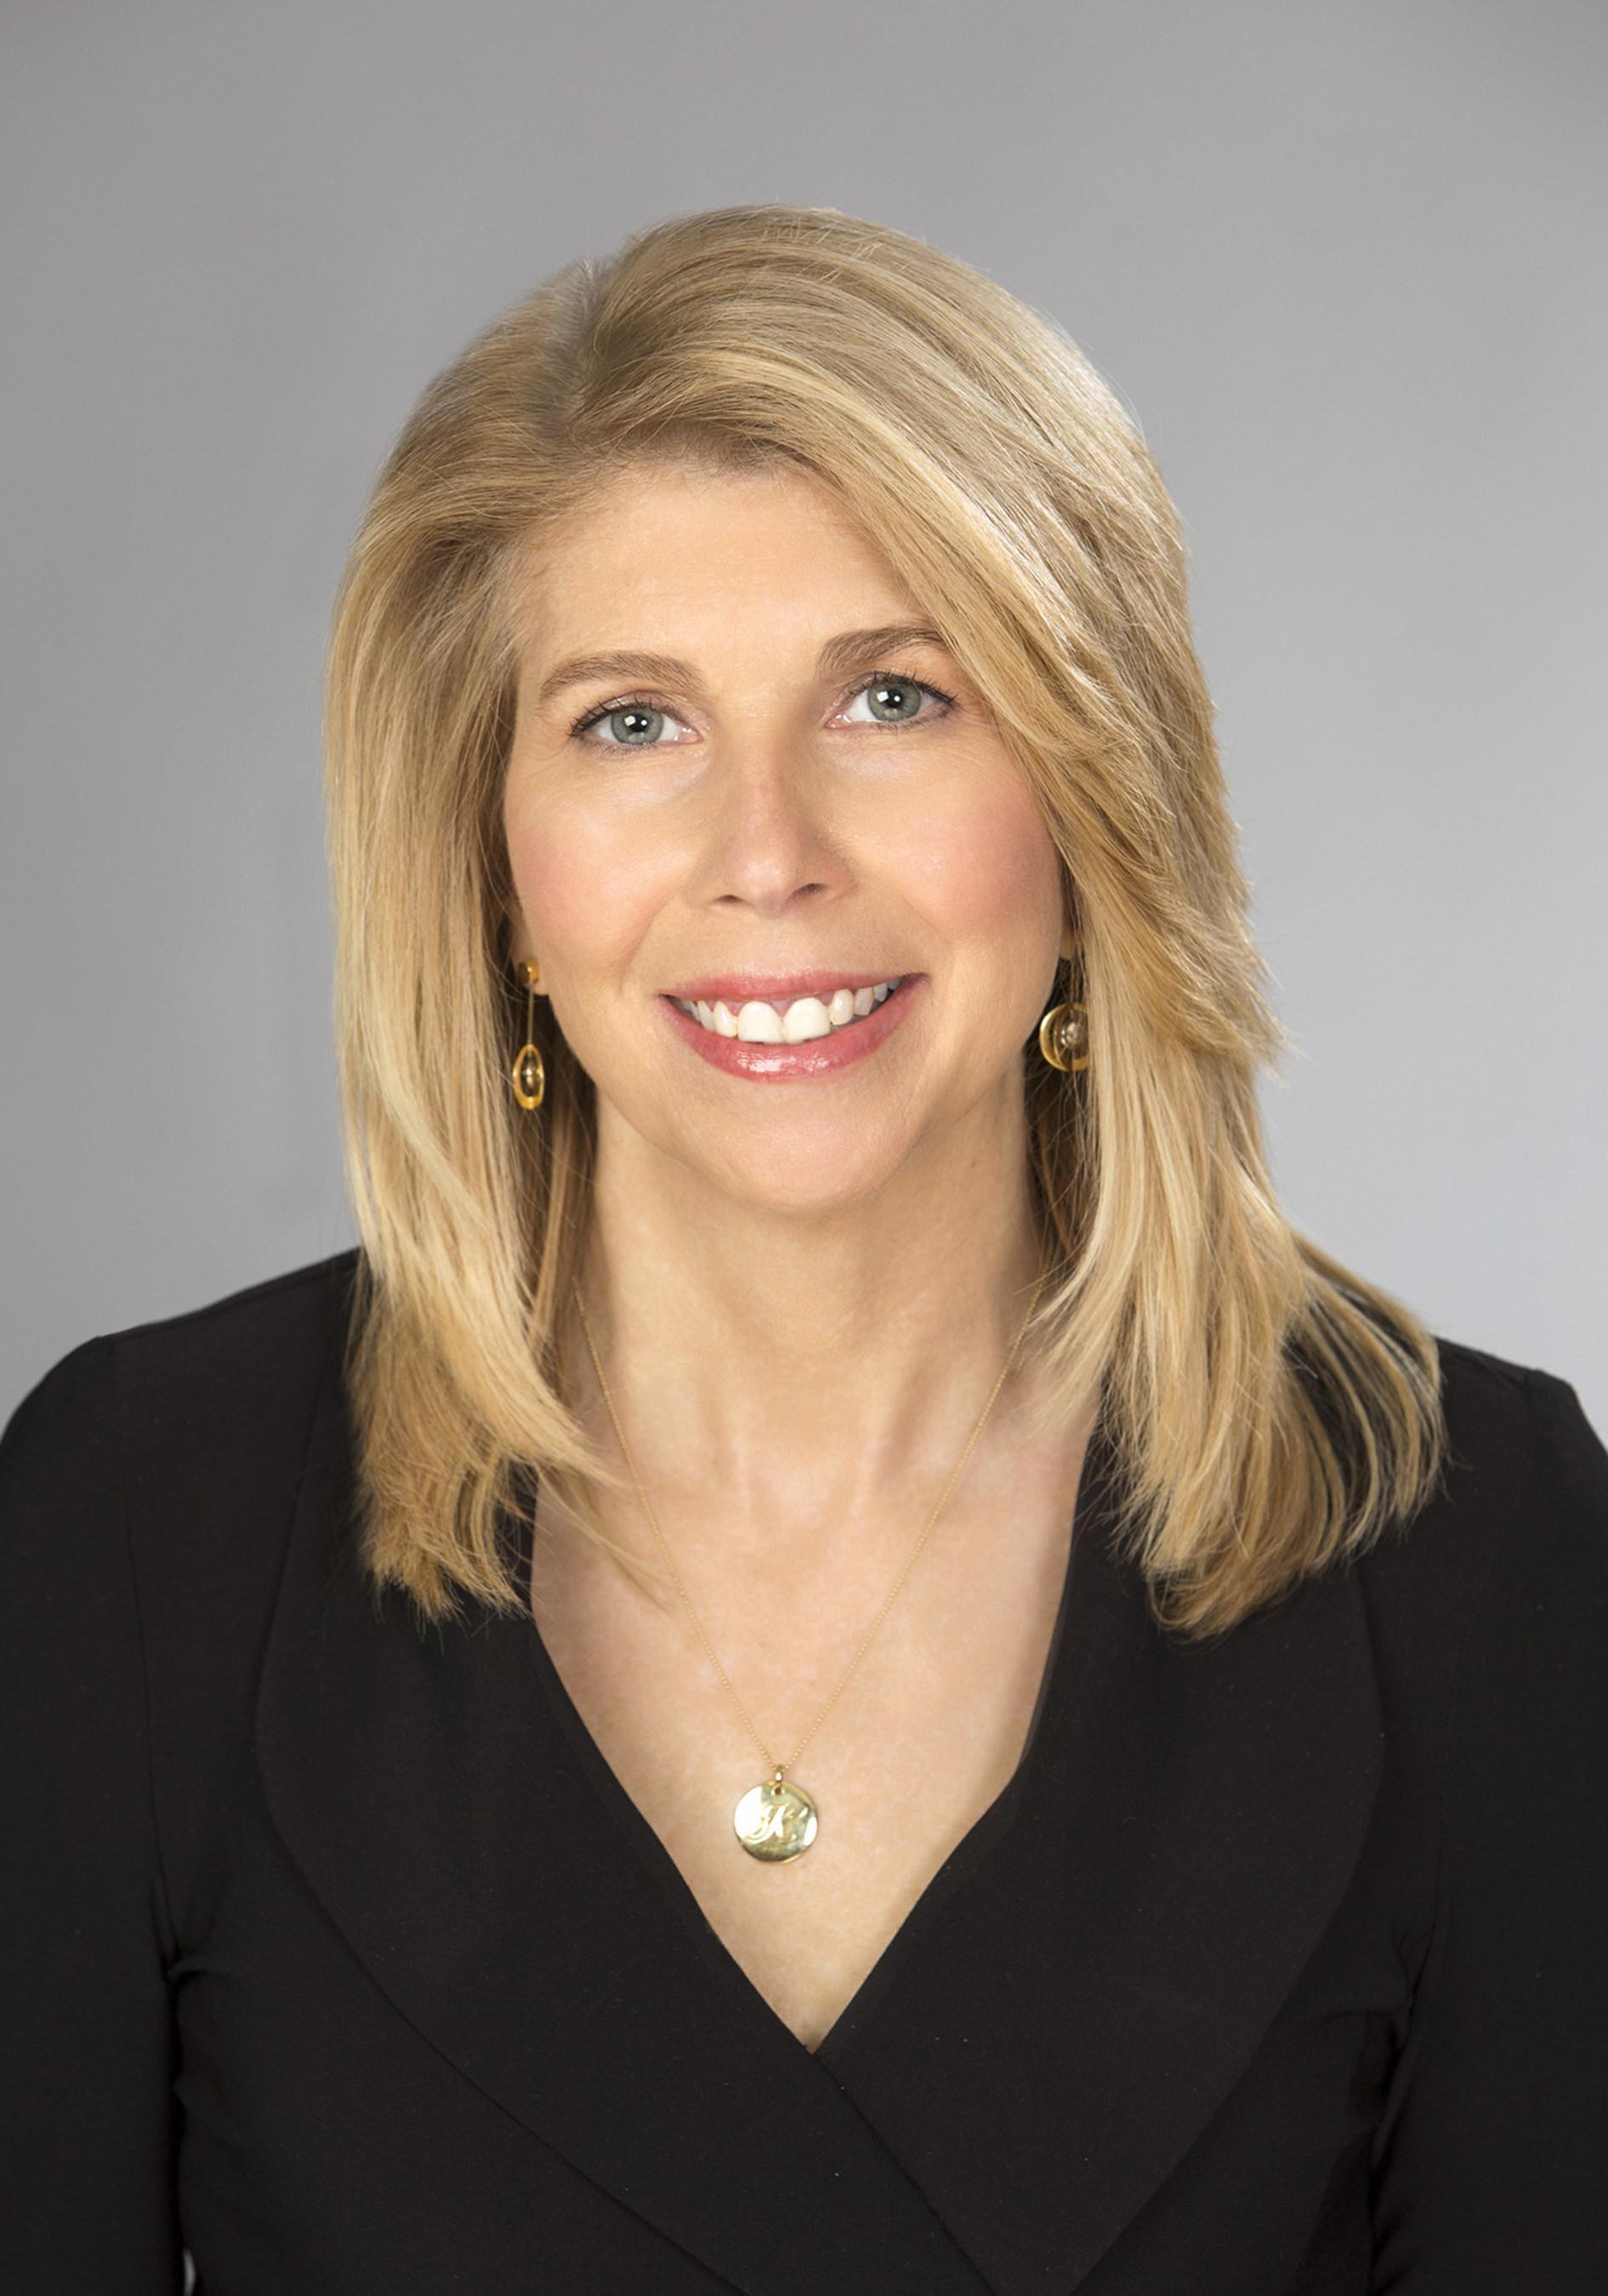 Kerri Kaplan, President and CEO, the Lustgarten Foundation